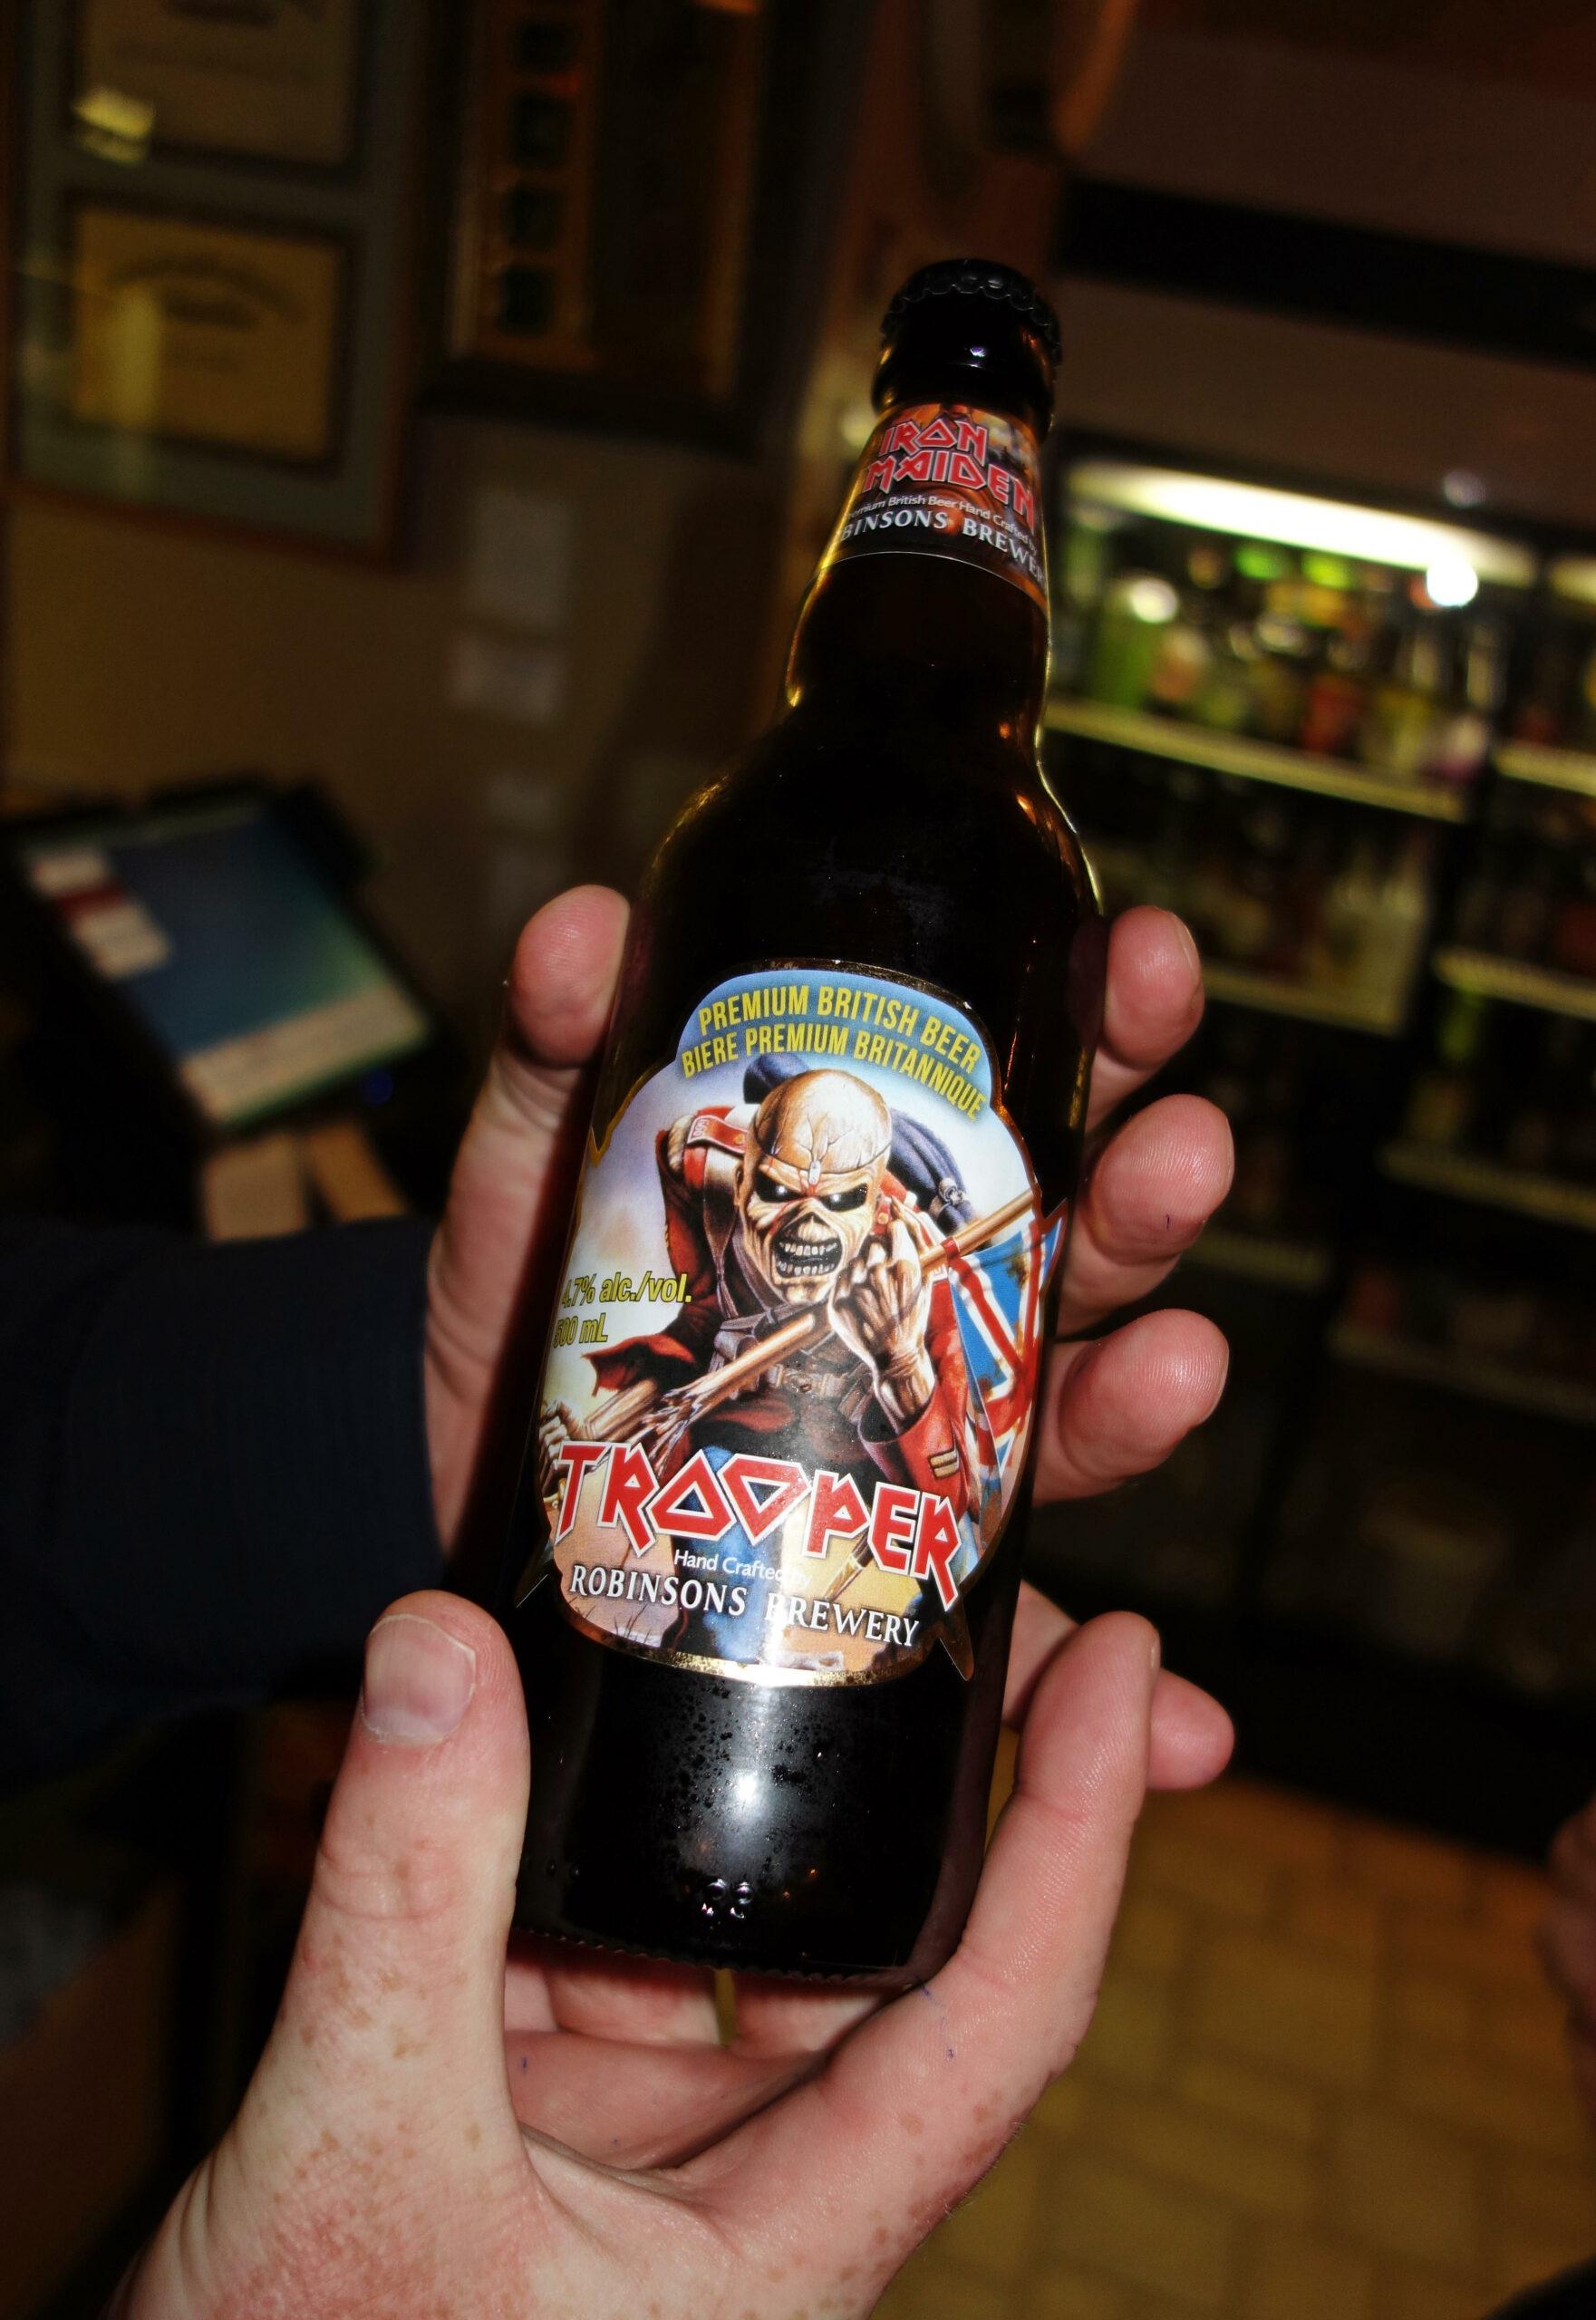 Iron Maiden beer